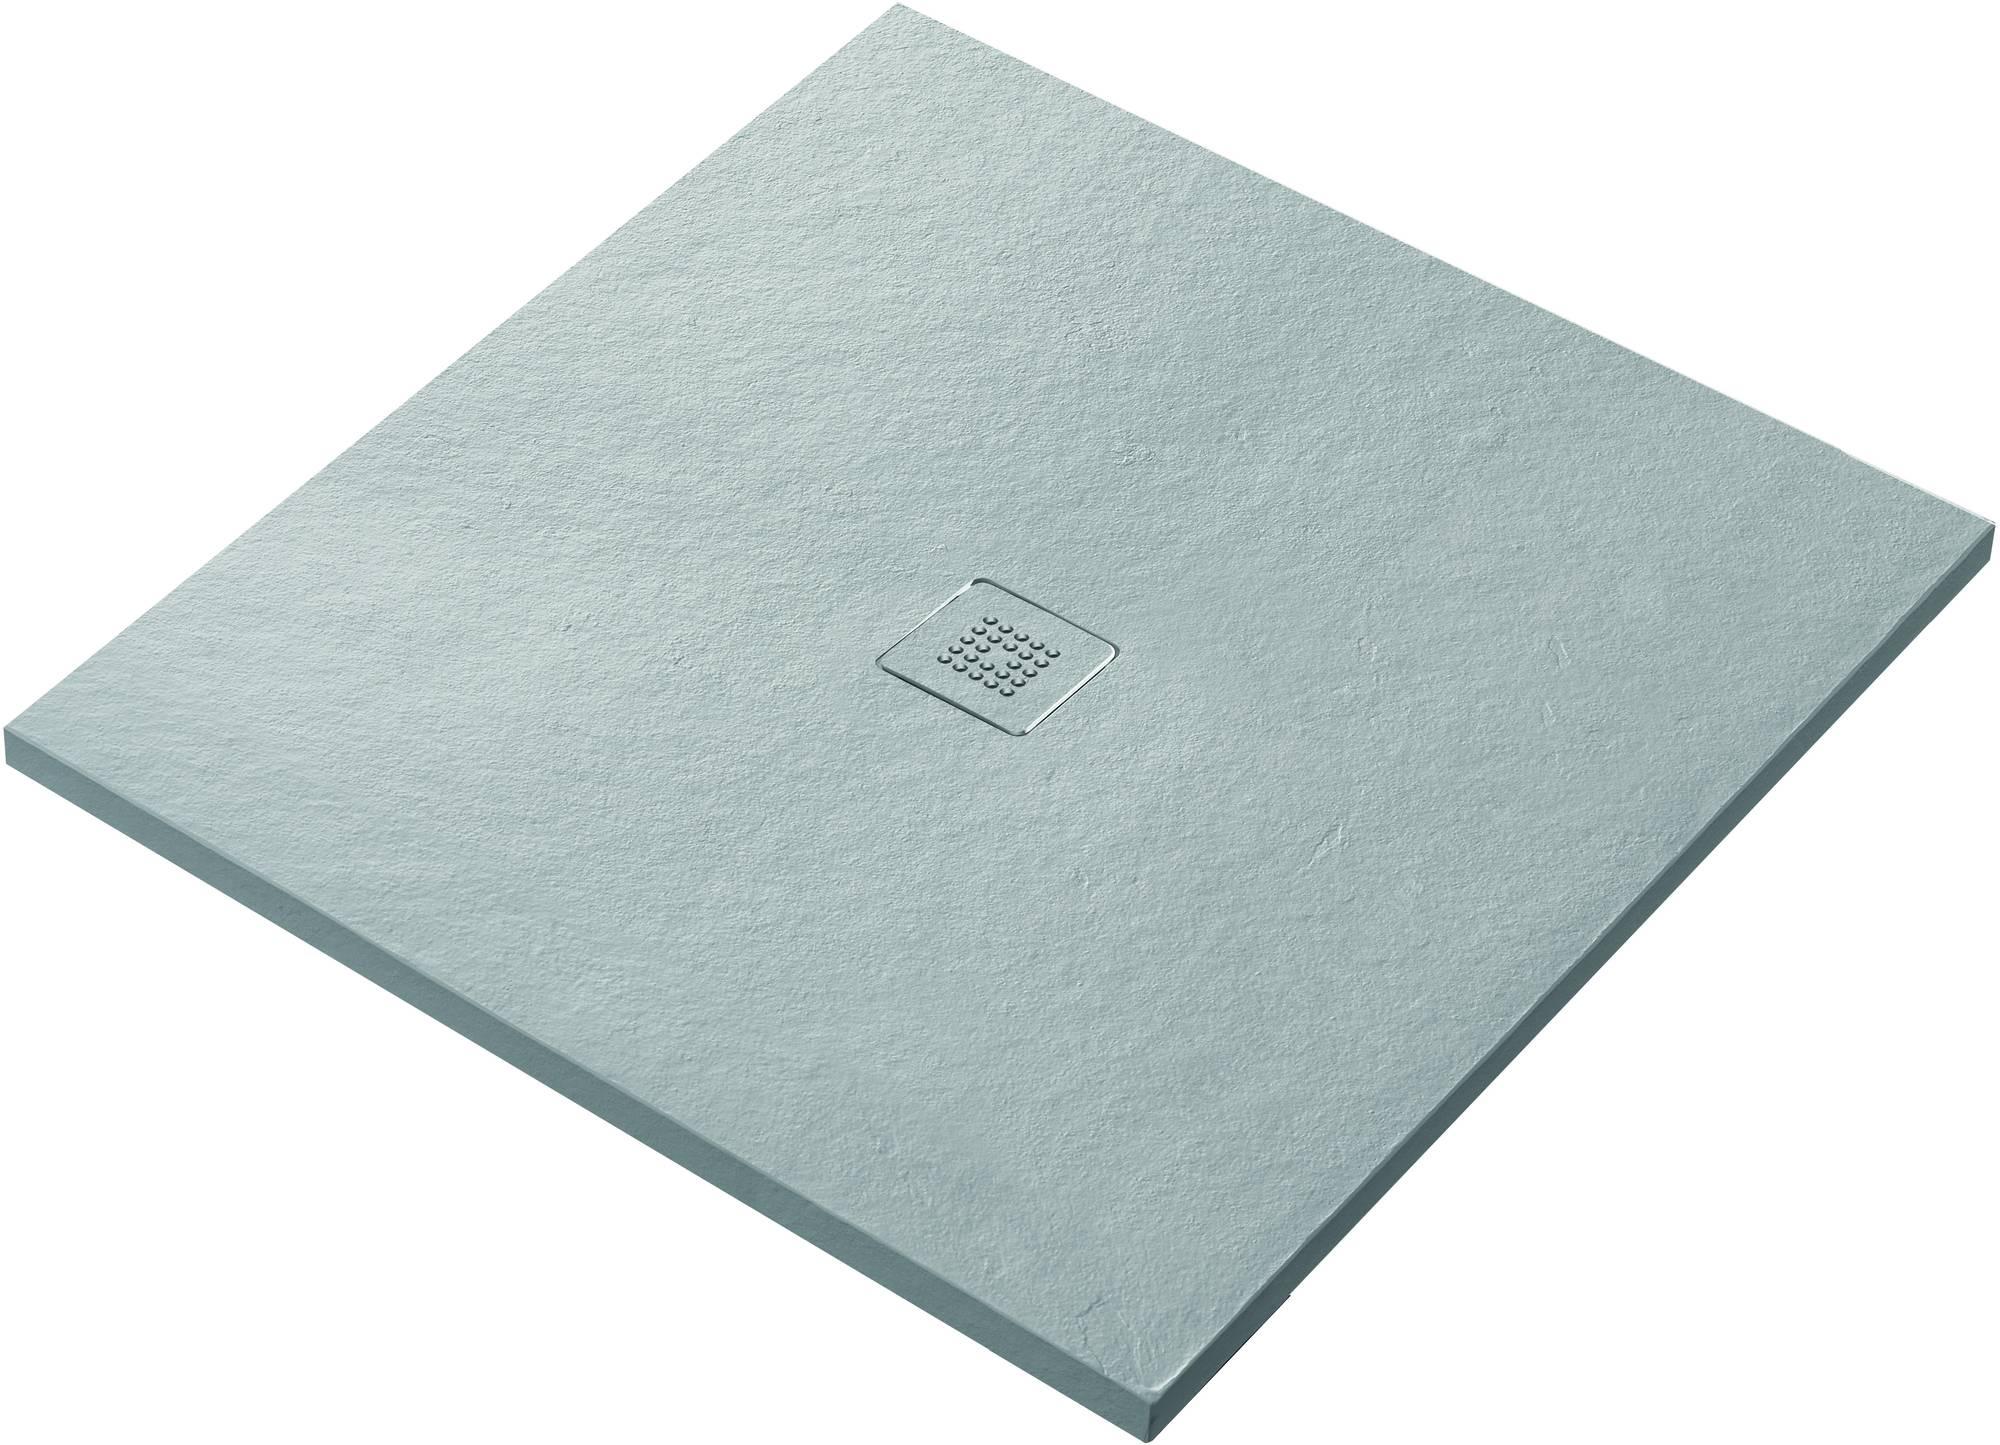 Ben Avira Douchevloer Akron 100x100x2,6 cm Blanco